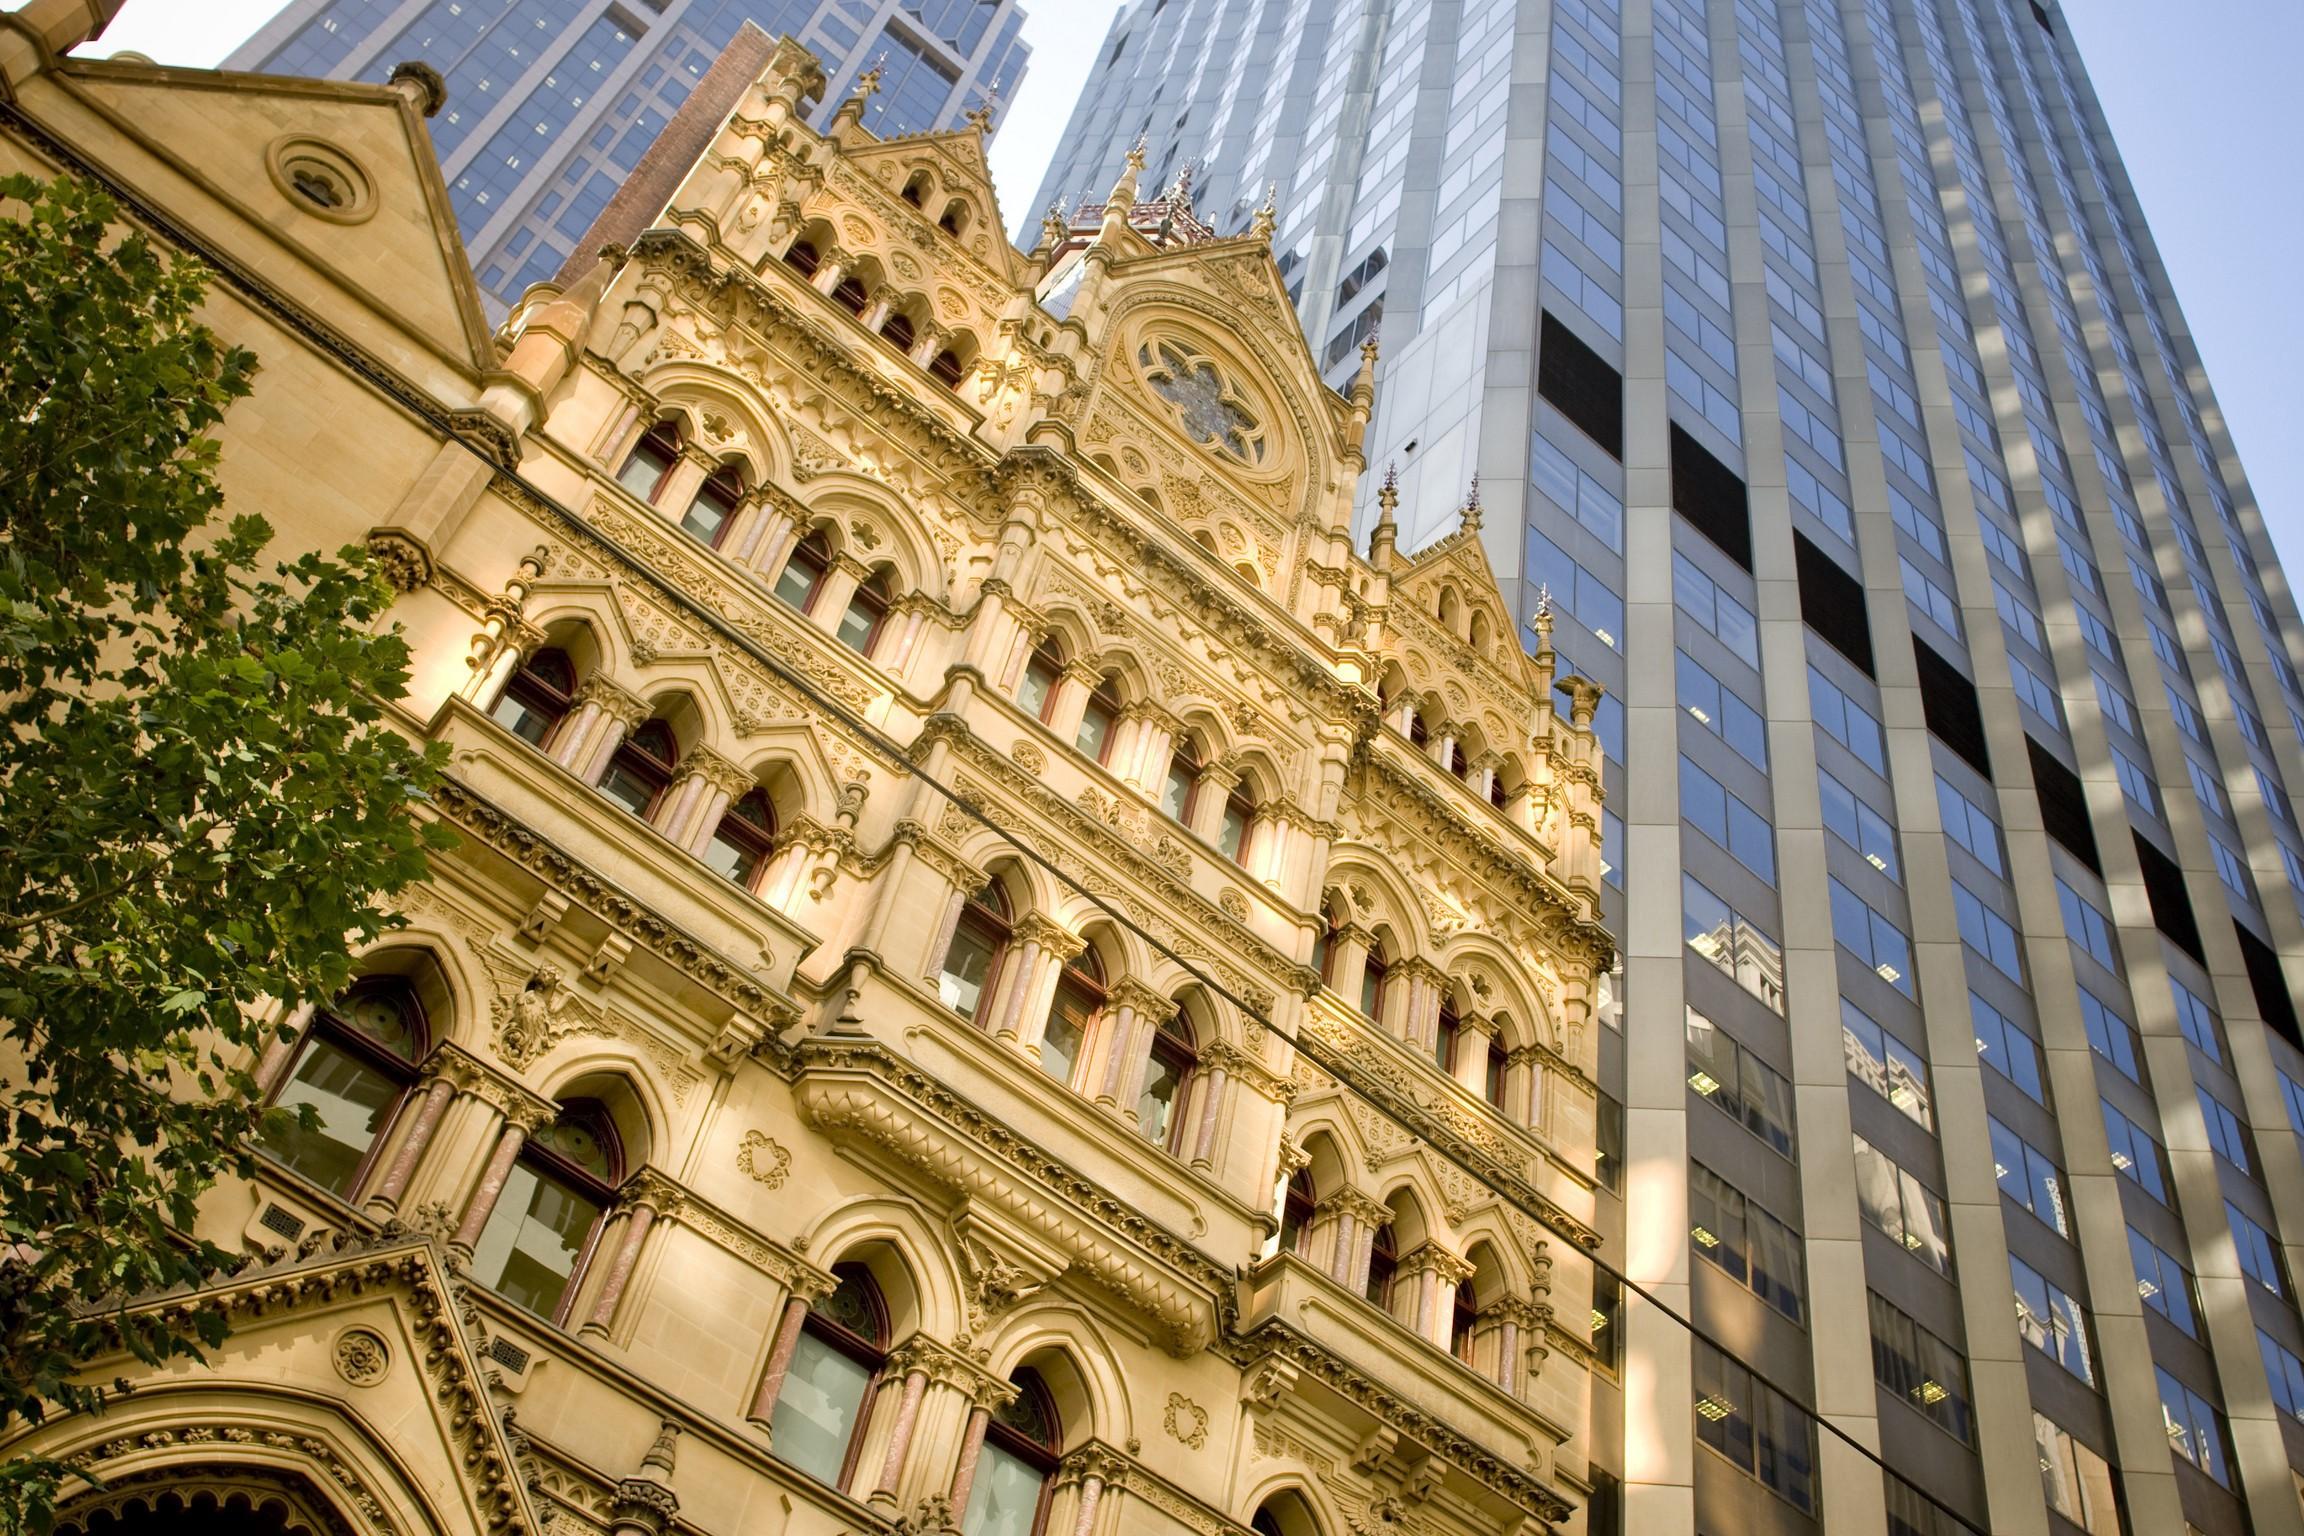 Melbourne Walking Tour-Melbourne History Tour-Gold Fever-Gothic Bank Melbourne